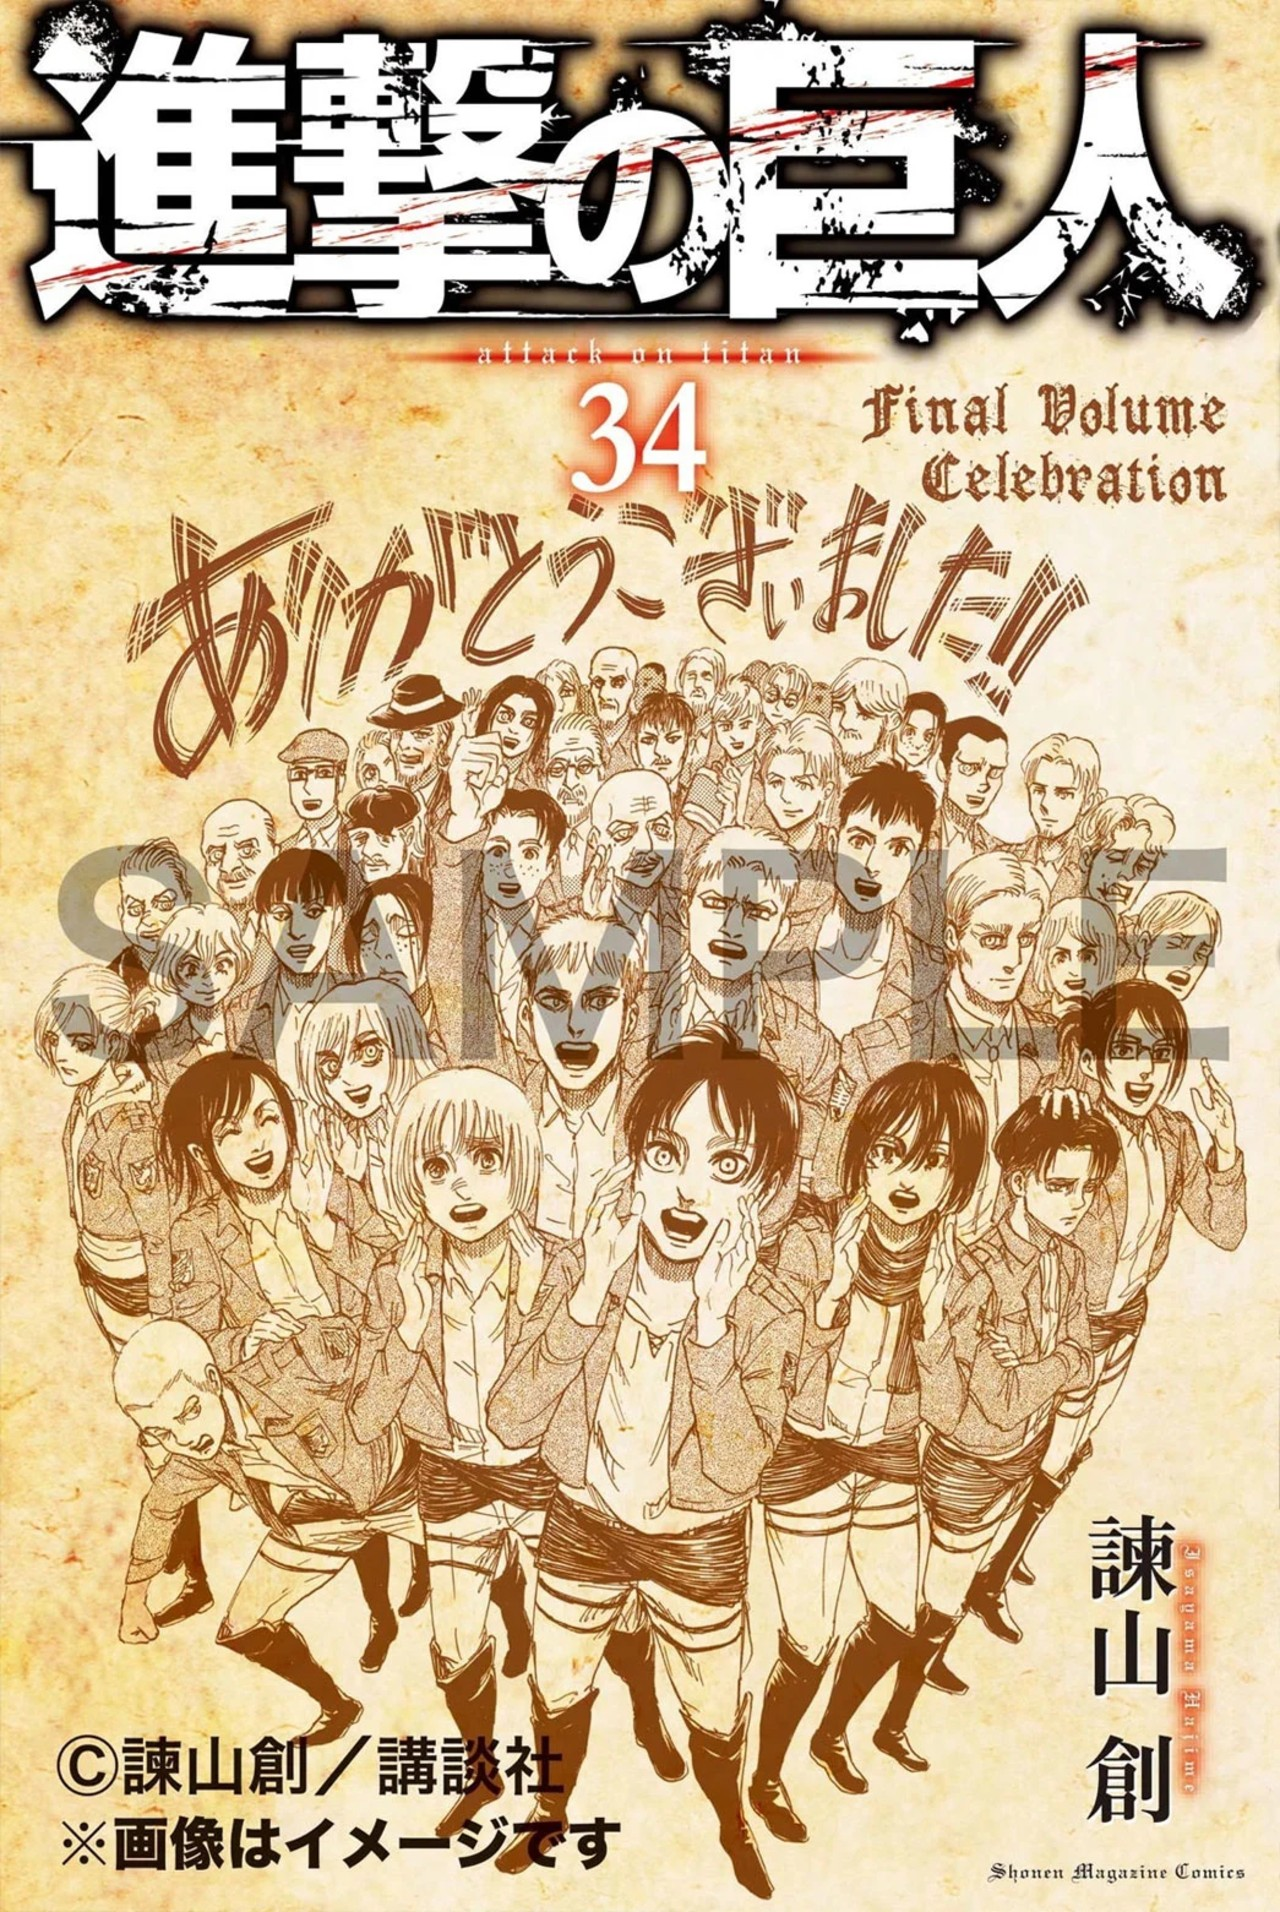 Attack on Titan volumen 34 especial